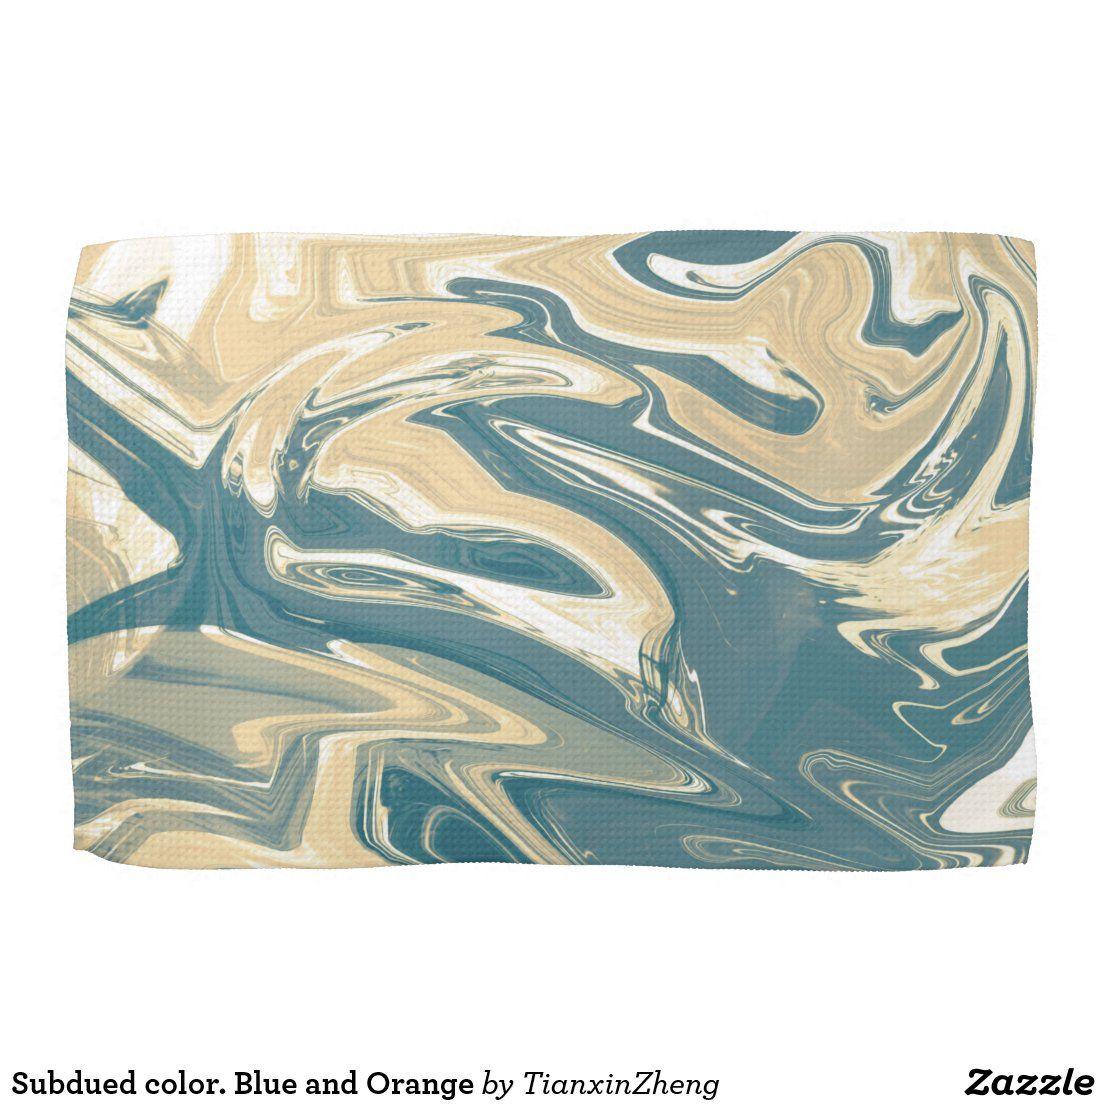 subdued color blue and orange kitchen towel zazzle com in 2020 orange kitchen kitchen towels muted colors pinterest